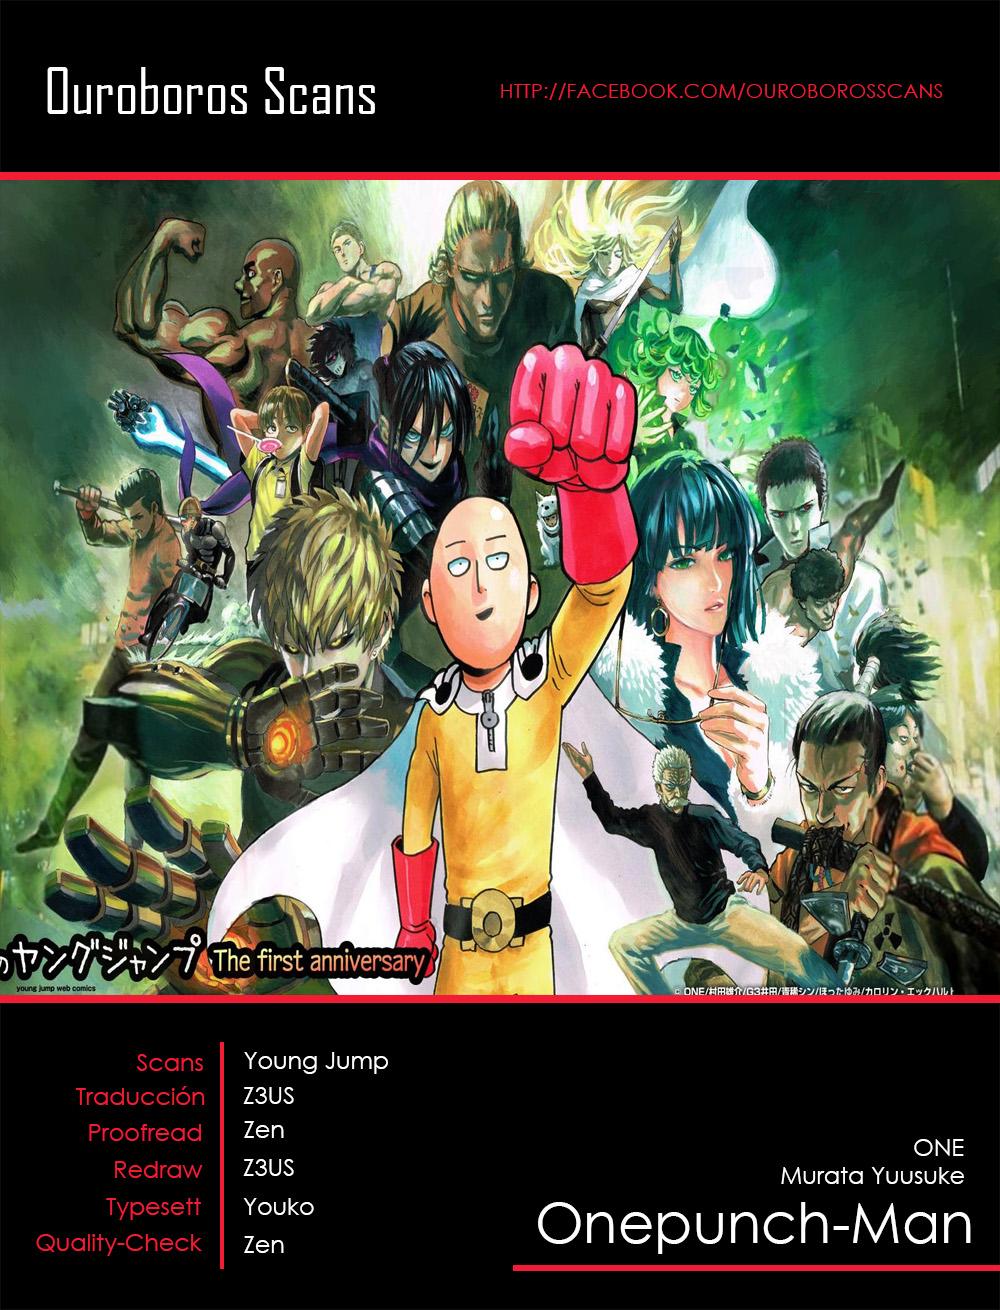 http://c5.ninemanga.com/es_manga/21/14805/382970/b1e029e2fa78ca8833257c47727b46c5.jpg Page 1